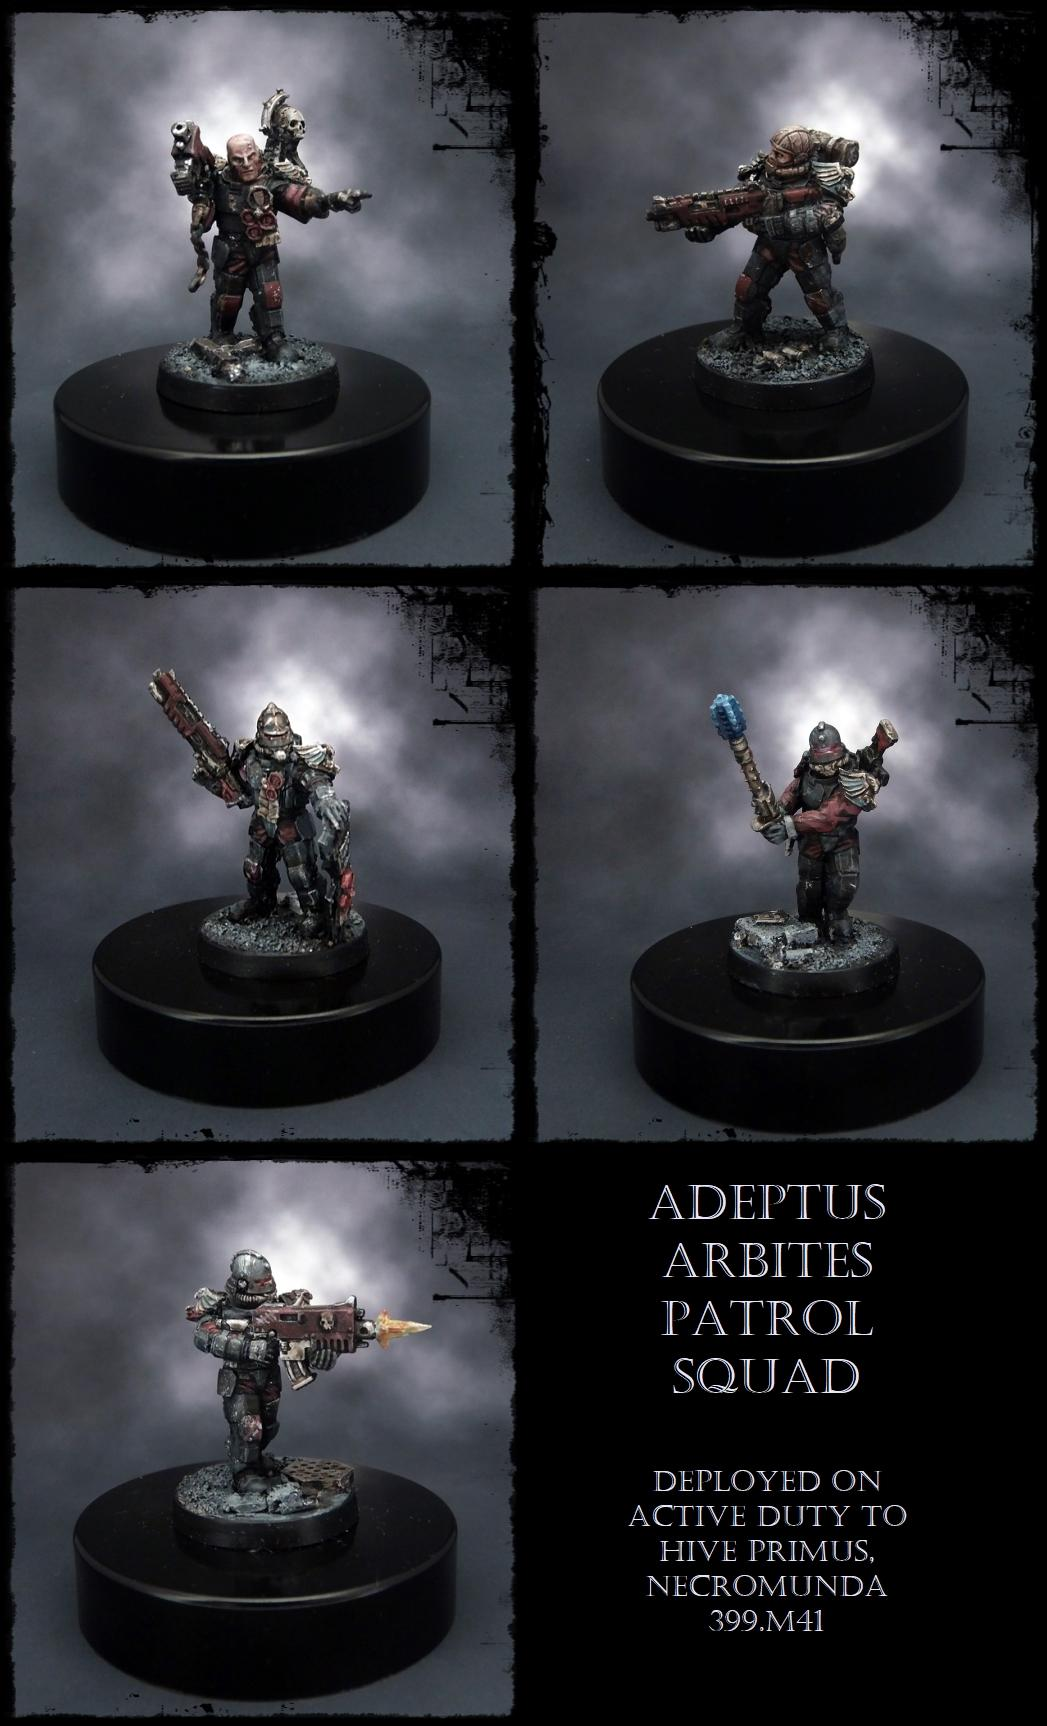 Adeptus Arbites, Alternative Models, Anvil, Enforcers, Necromunda, Warhammer 40,000